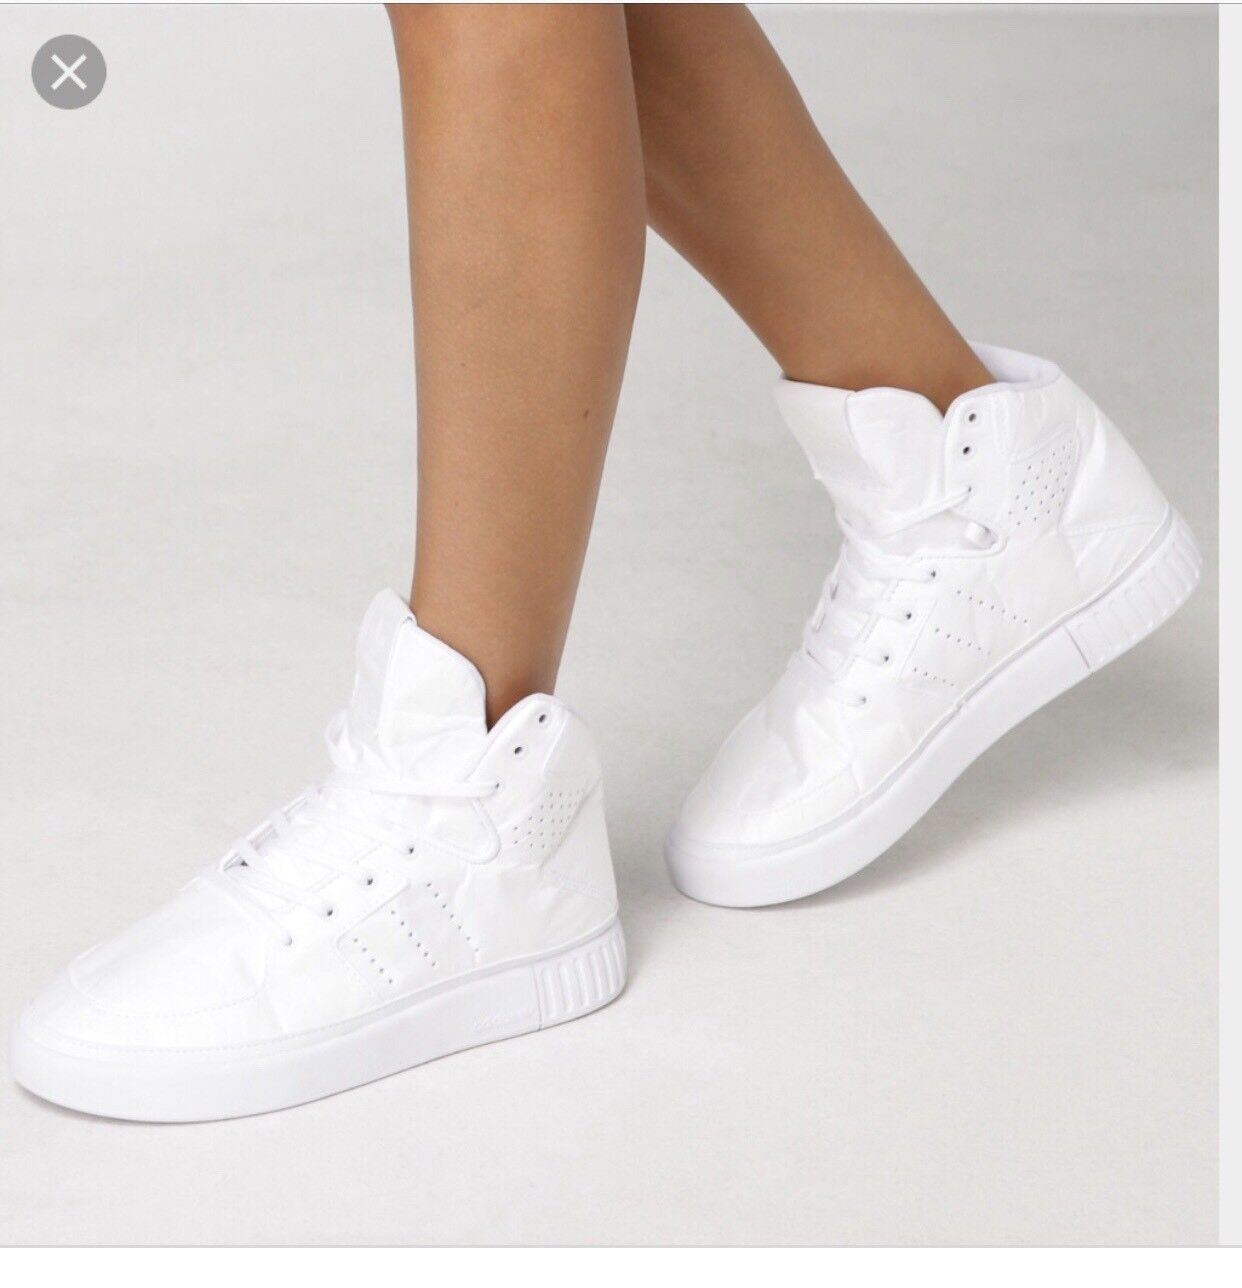 Adidas High Top Sneakers tubular invader 2.0 Decon Originals white women size 7